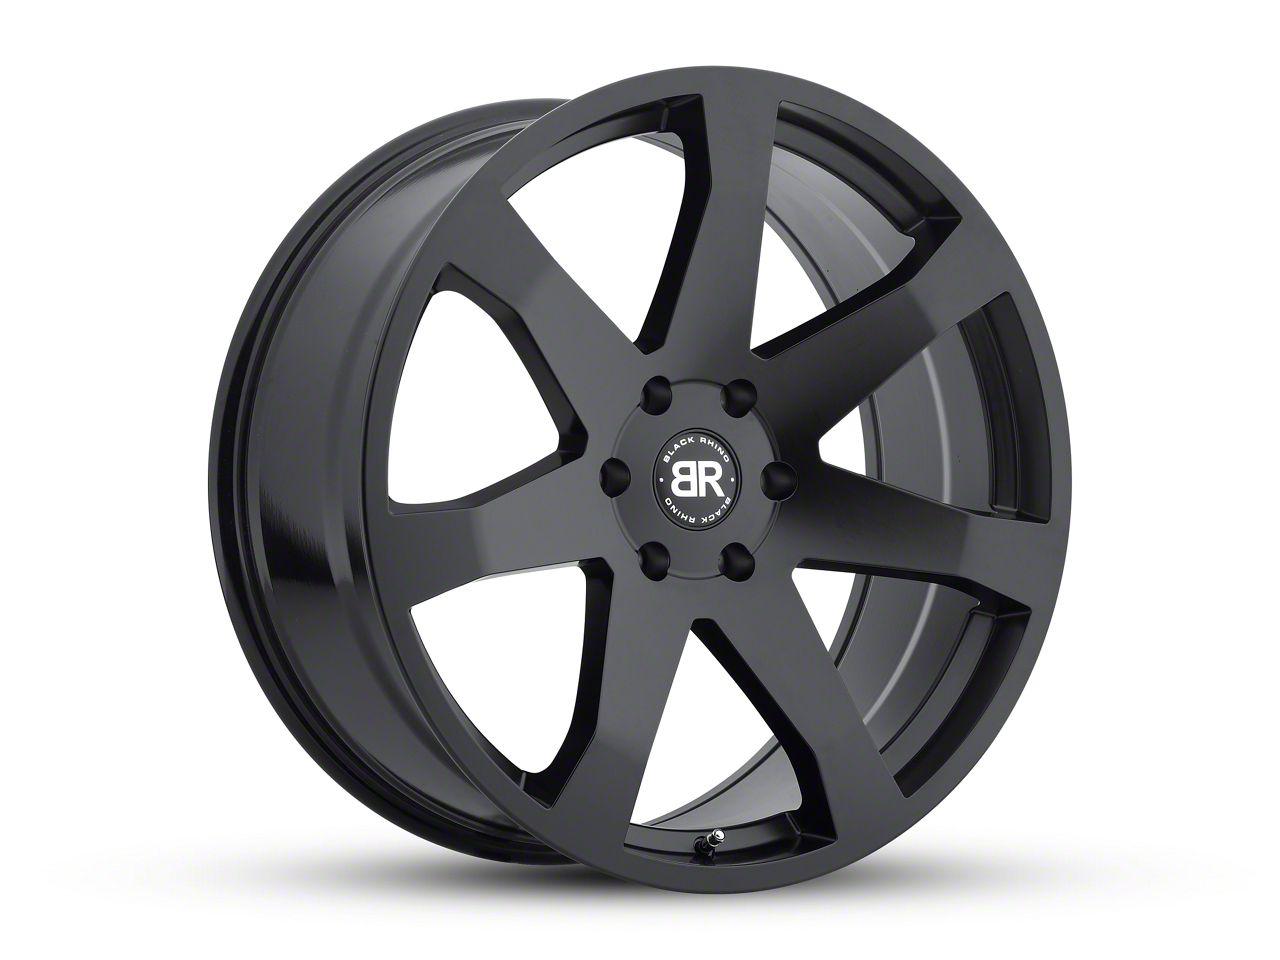 Black Rhino Mozambique Matte Black Wheels (07-18 Jeep Wrangler JK; 2018 Jeep Wrangler JL)